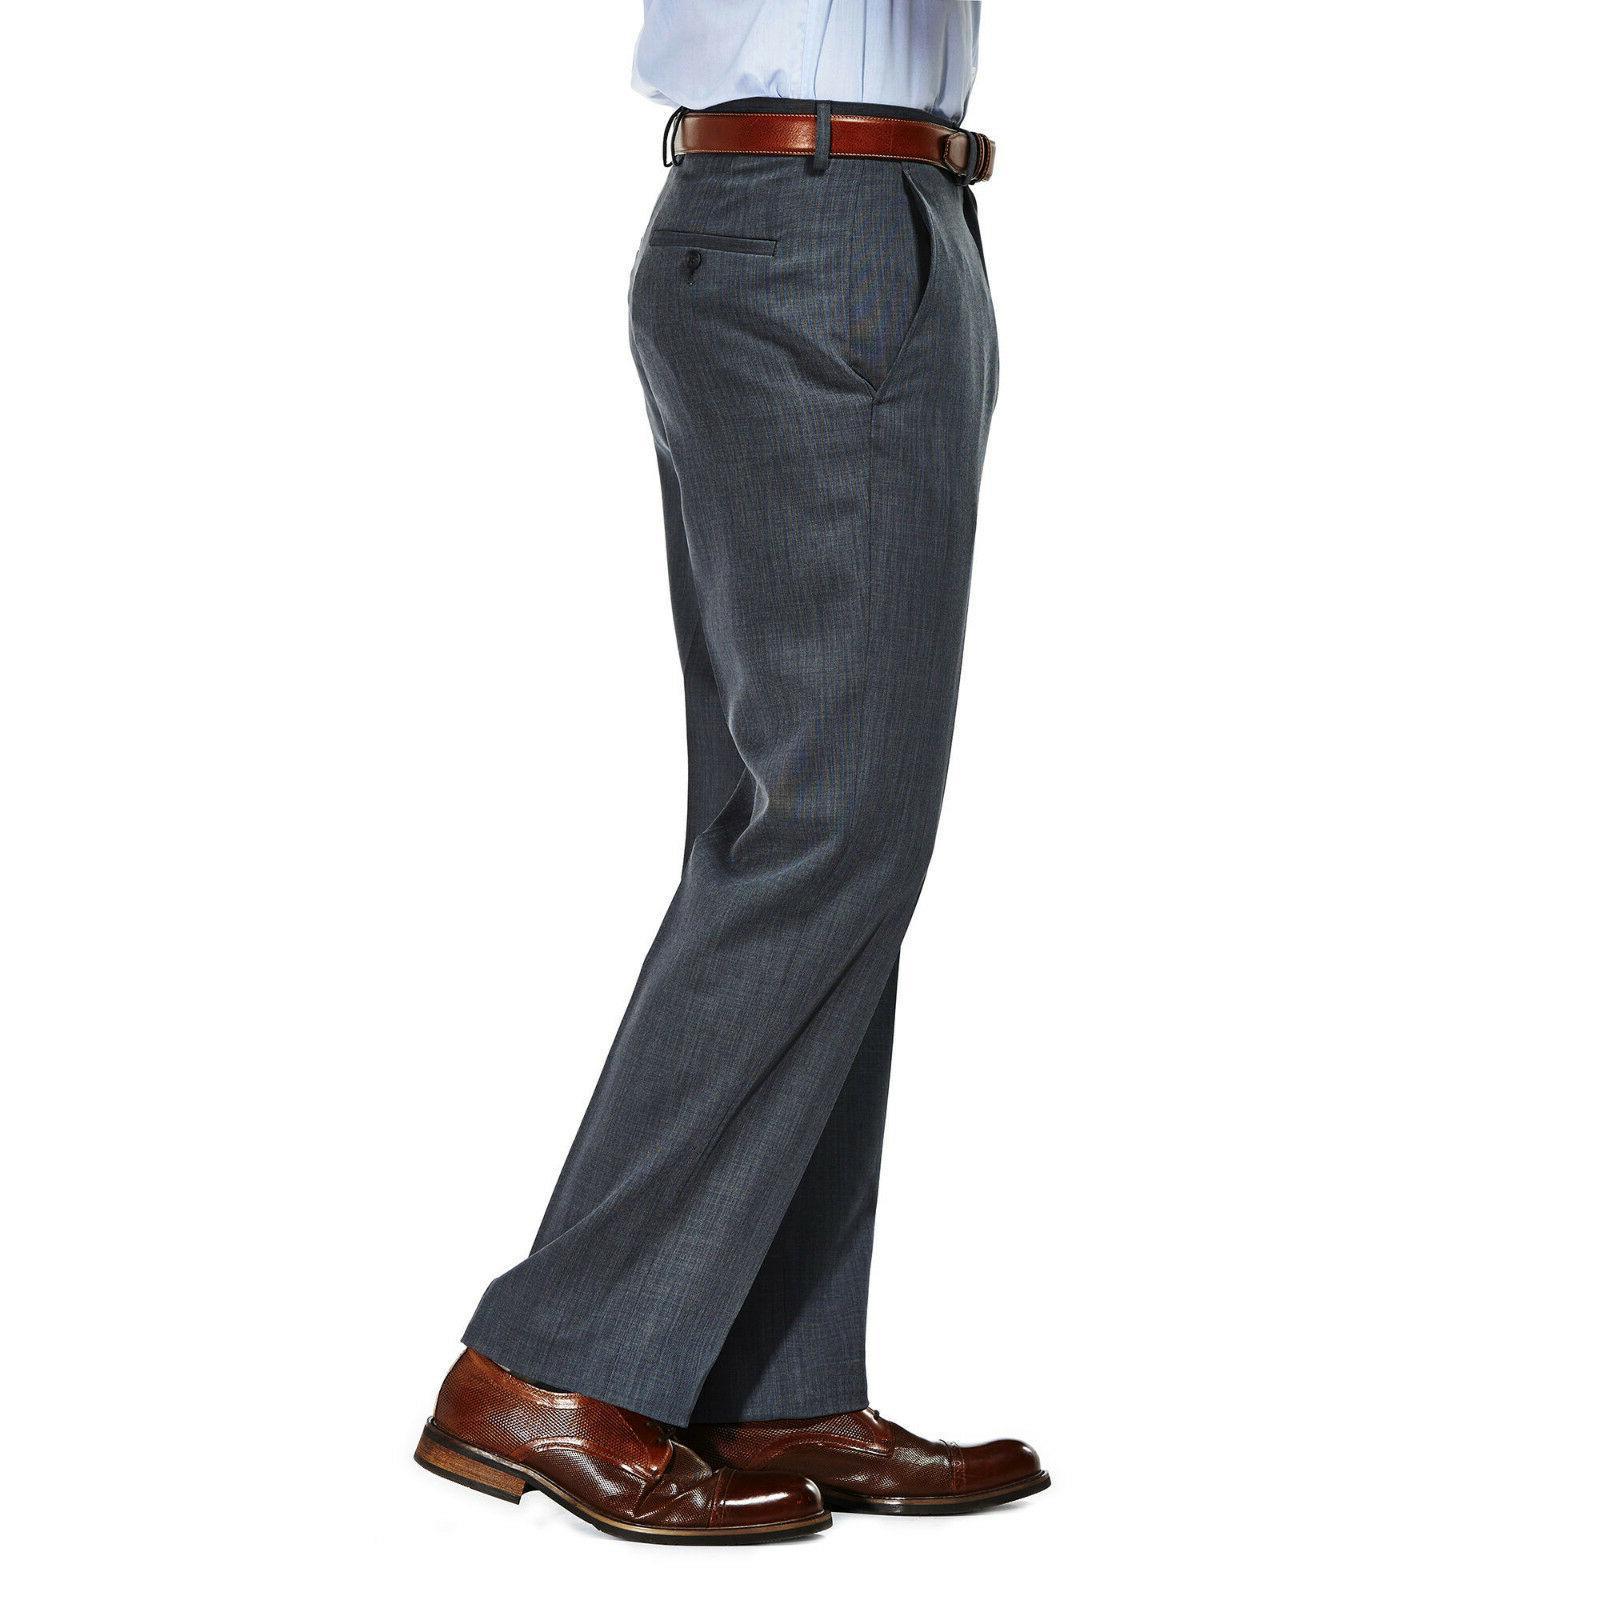 NEW Sz 32x32 Haggar Travel Performance Suit Pants Graphit